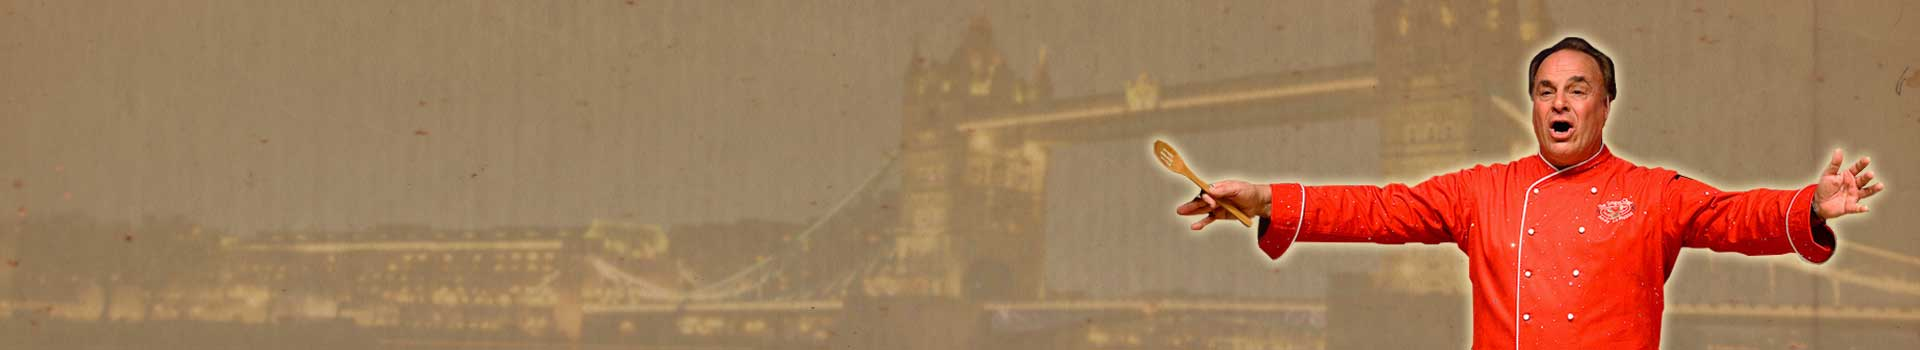 London Bridge behind Andy LoRusso